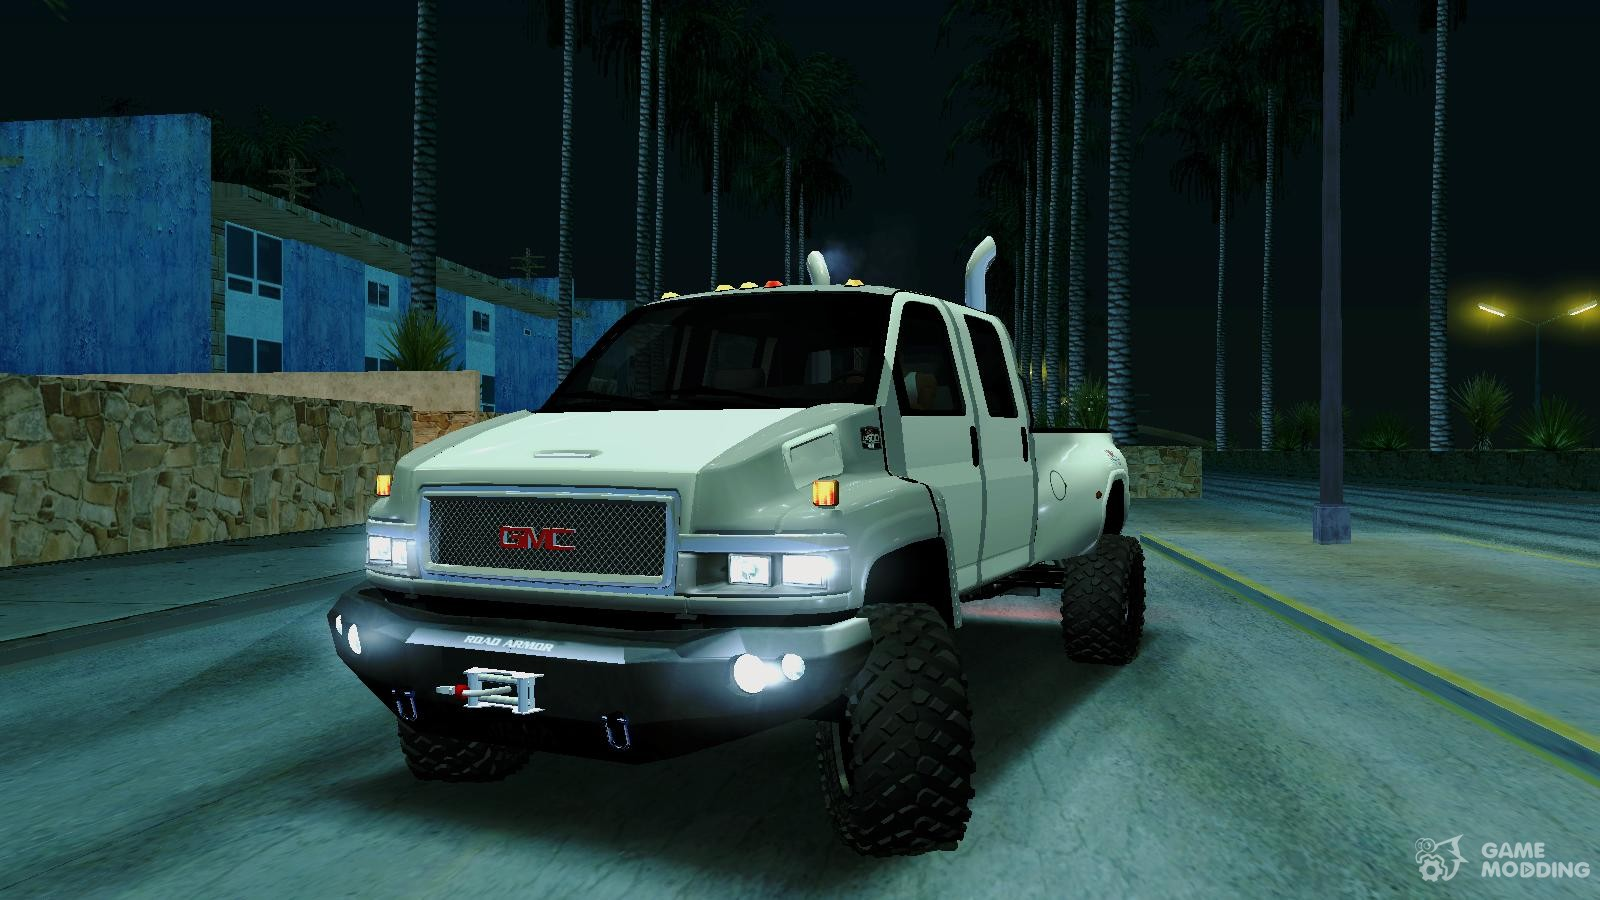 Gmc Topkick Ironhide Tf2 For Gta San Andreas